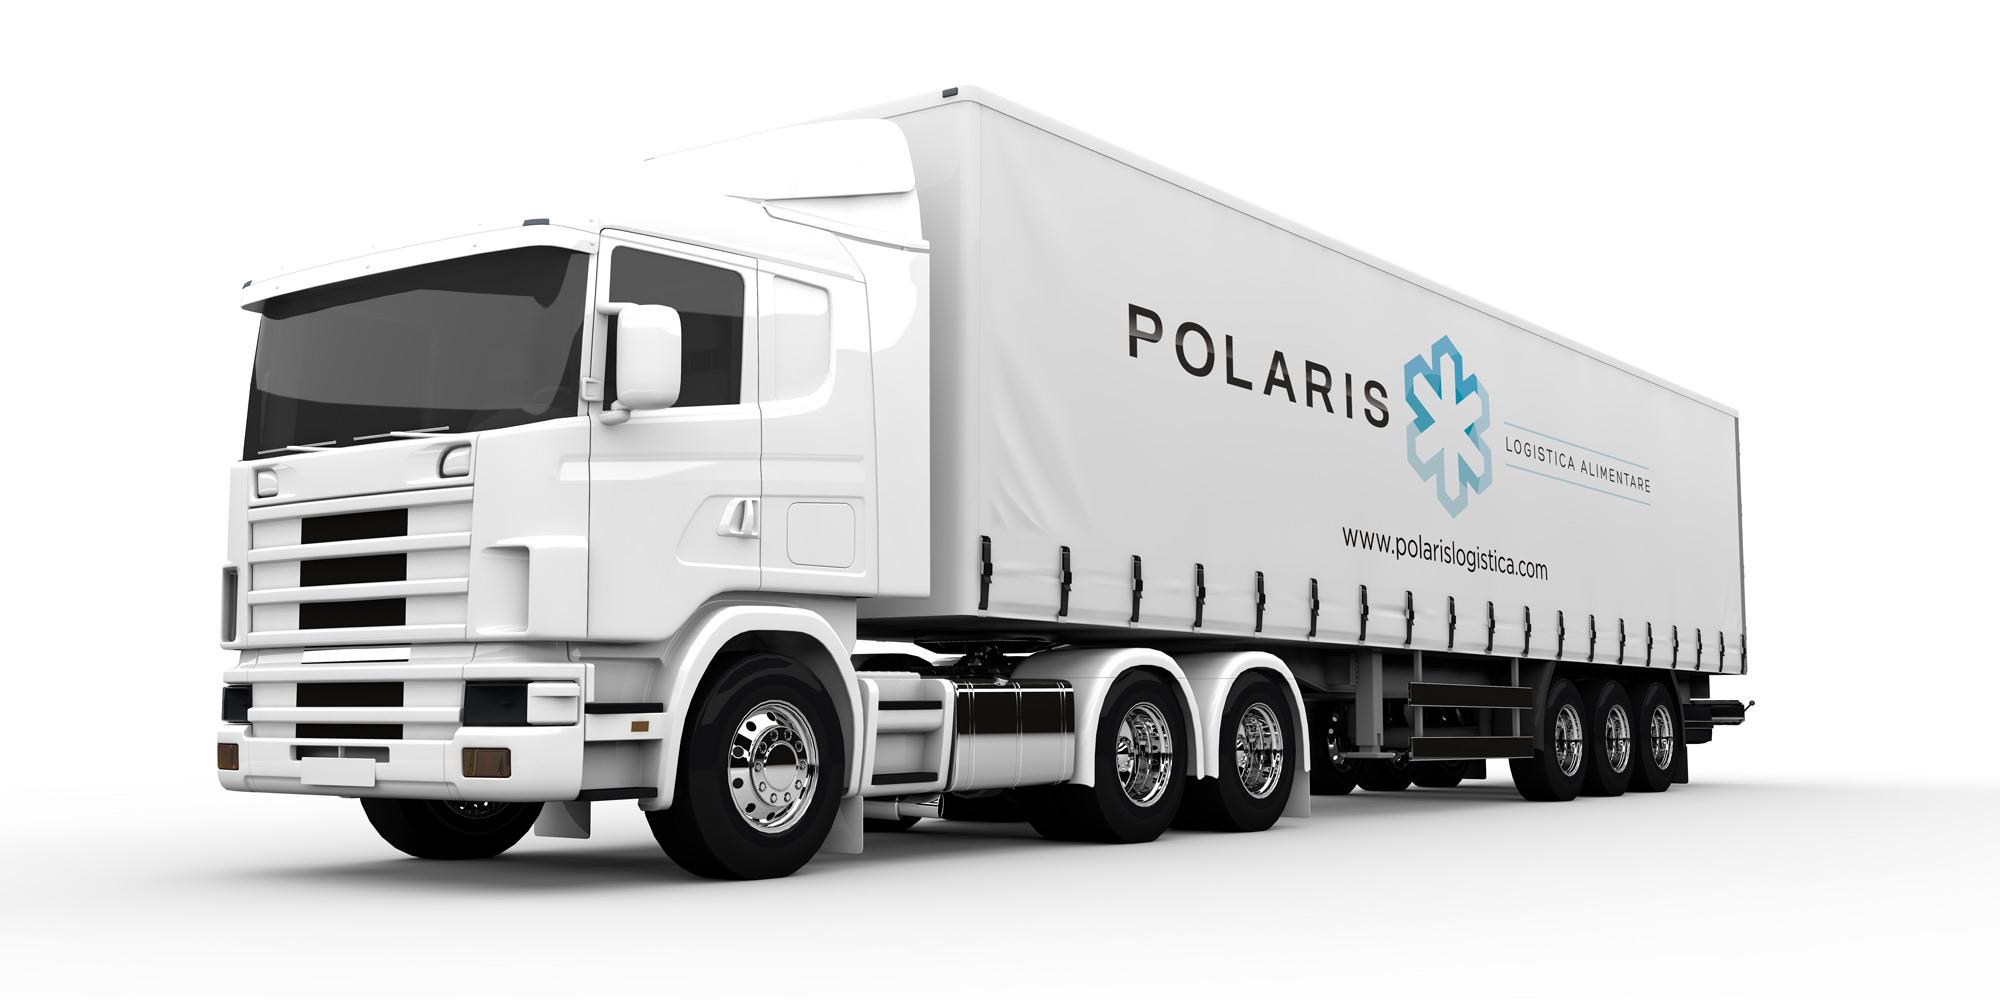 {focus_keyword} Allestimento grafico per bilico autoarticolato POLARIS POLARIS MOCKUP 03